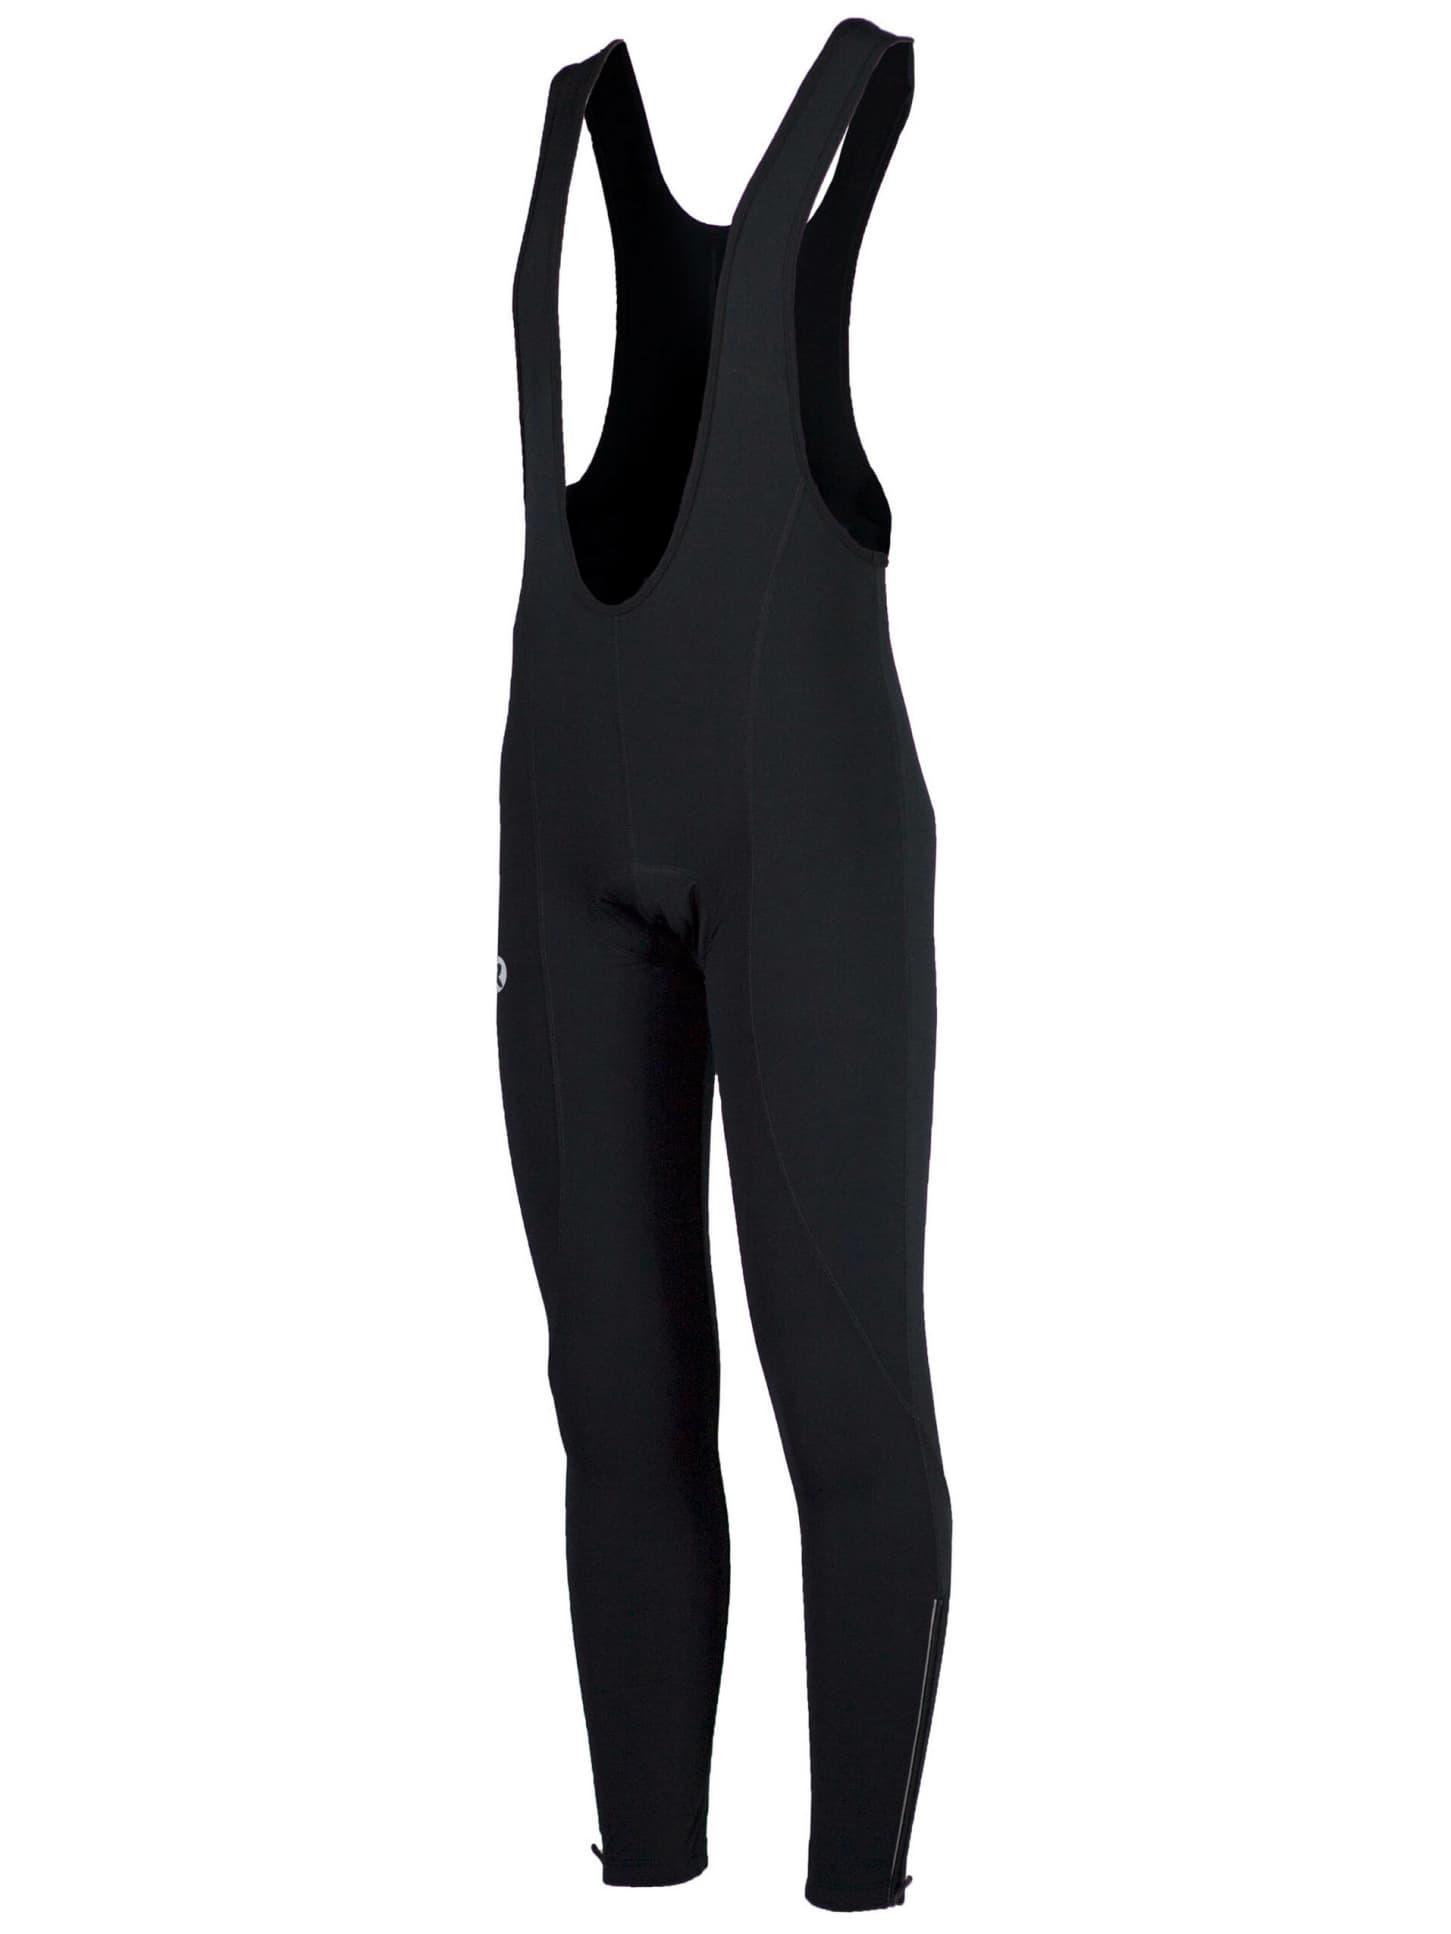 d2842f671ffea Zateplené cyklistické nohavice Rogelli TAVON, čierne | Rogelli.sk